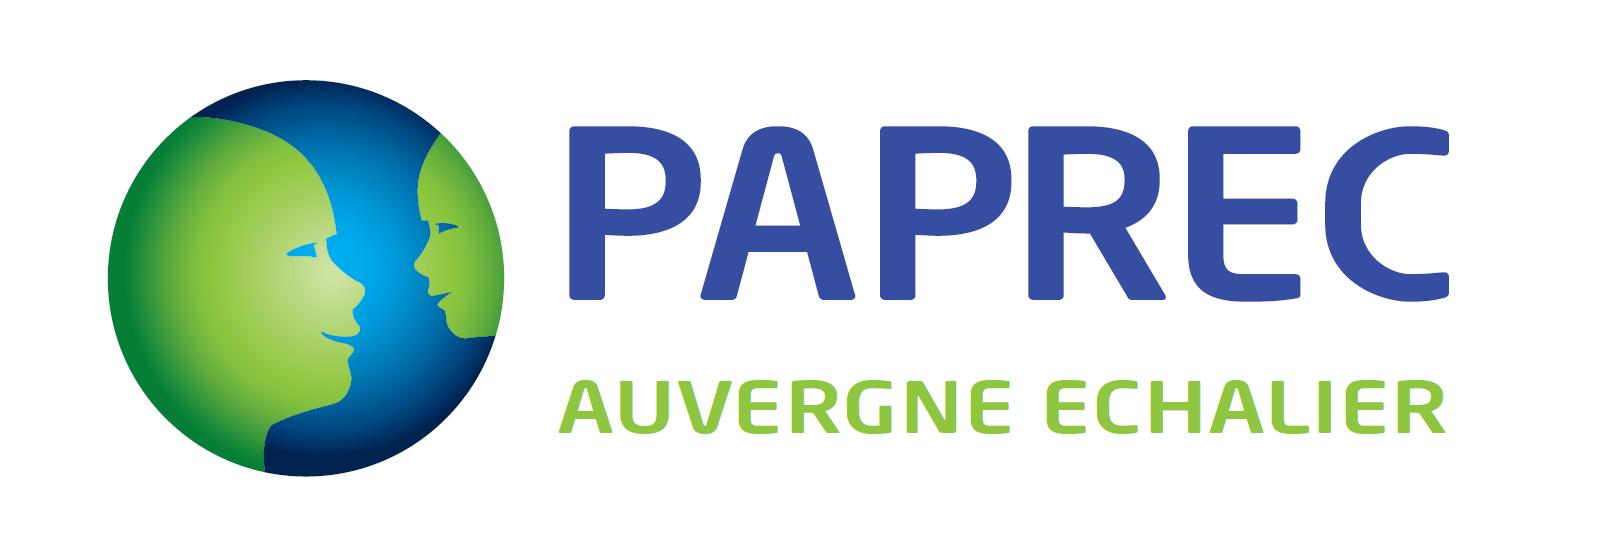 Logo PAPREC AUVERGNE ECHALIER